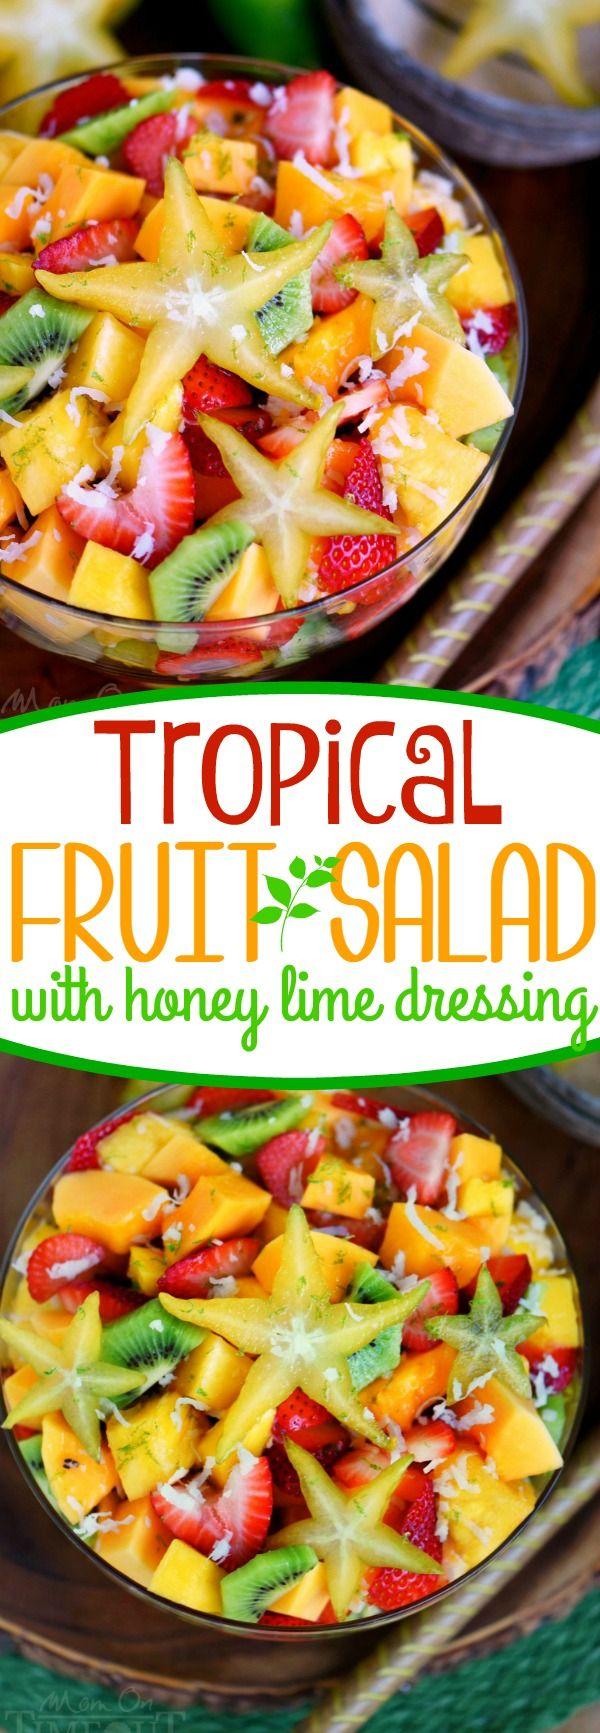 Tropical Fruit Salad with Honey Lime Dressing on MyRecipeMagic.com